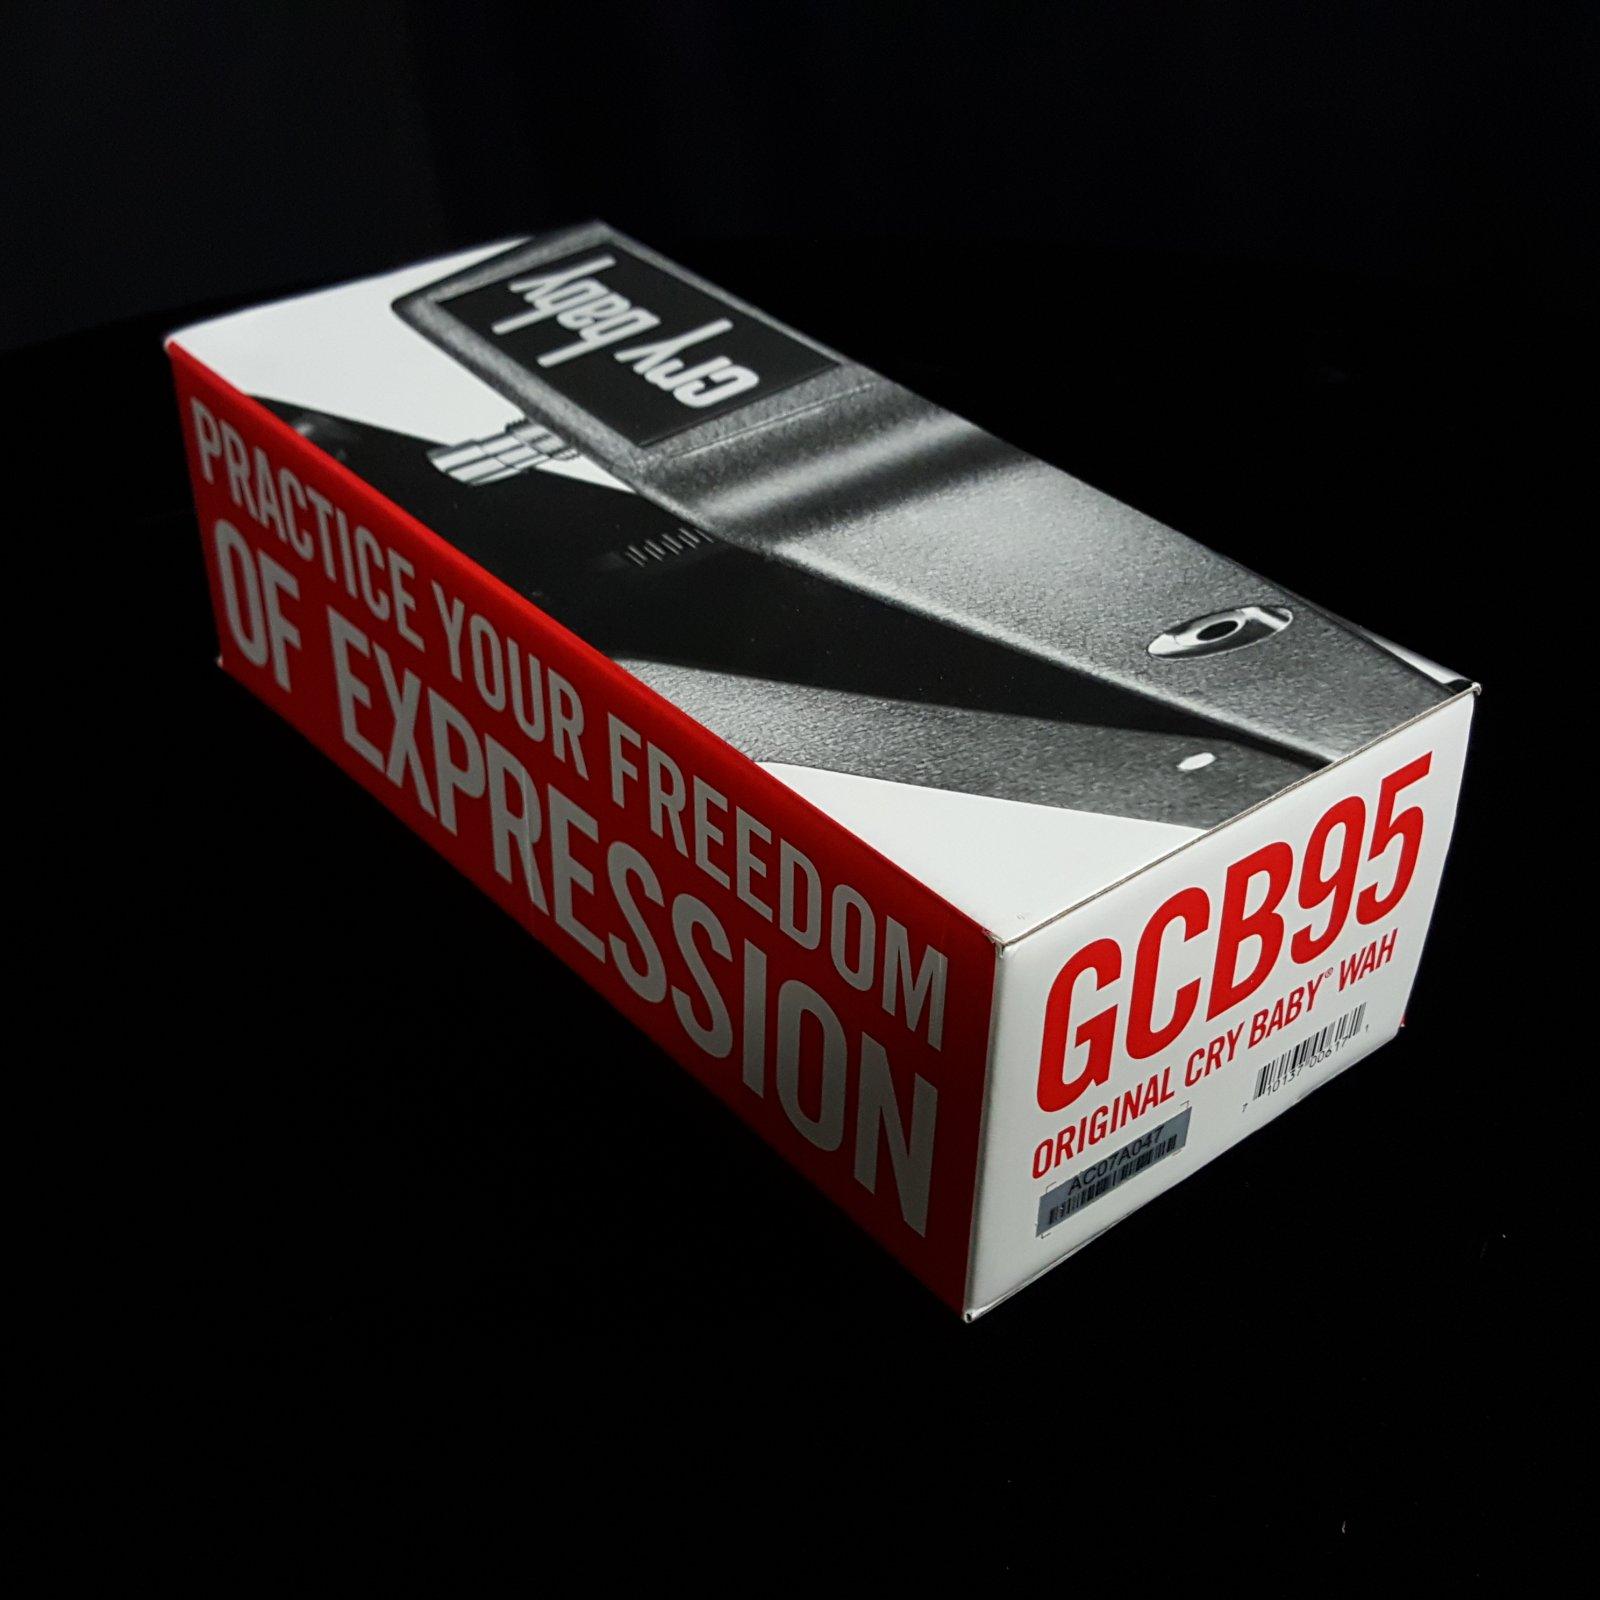 Dunlop Original Crybaby GCB95